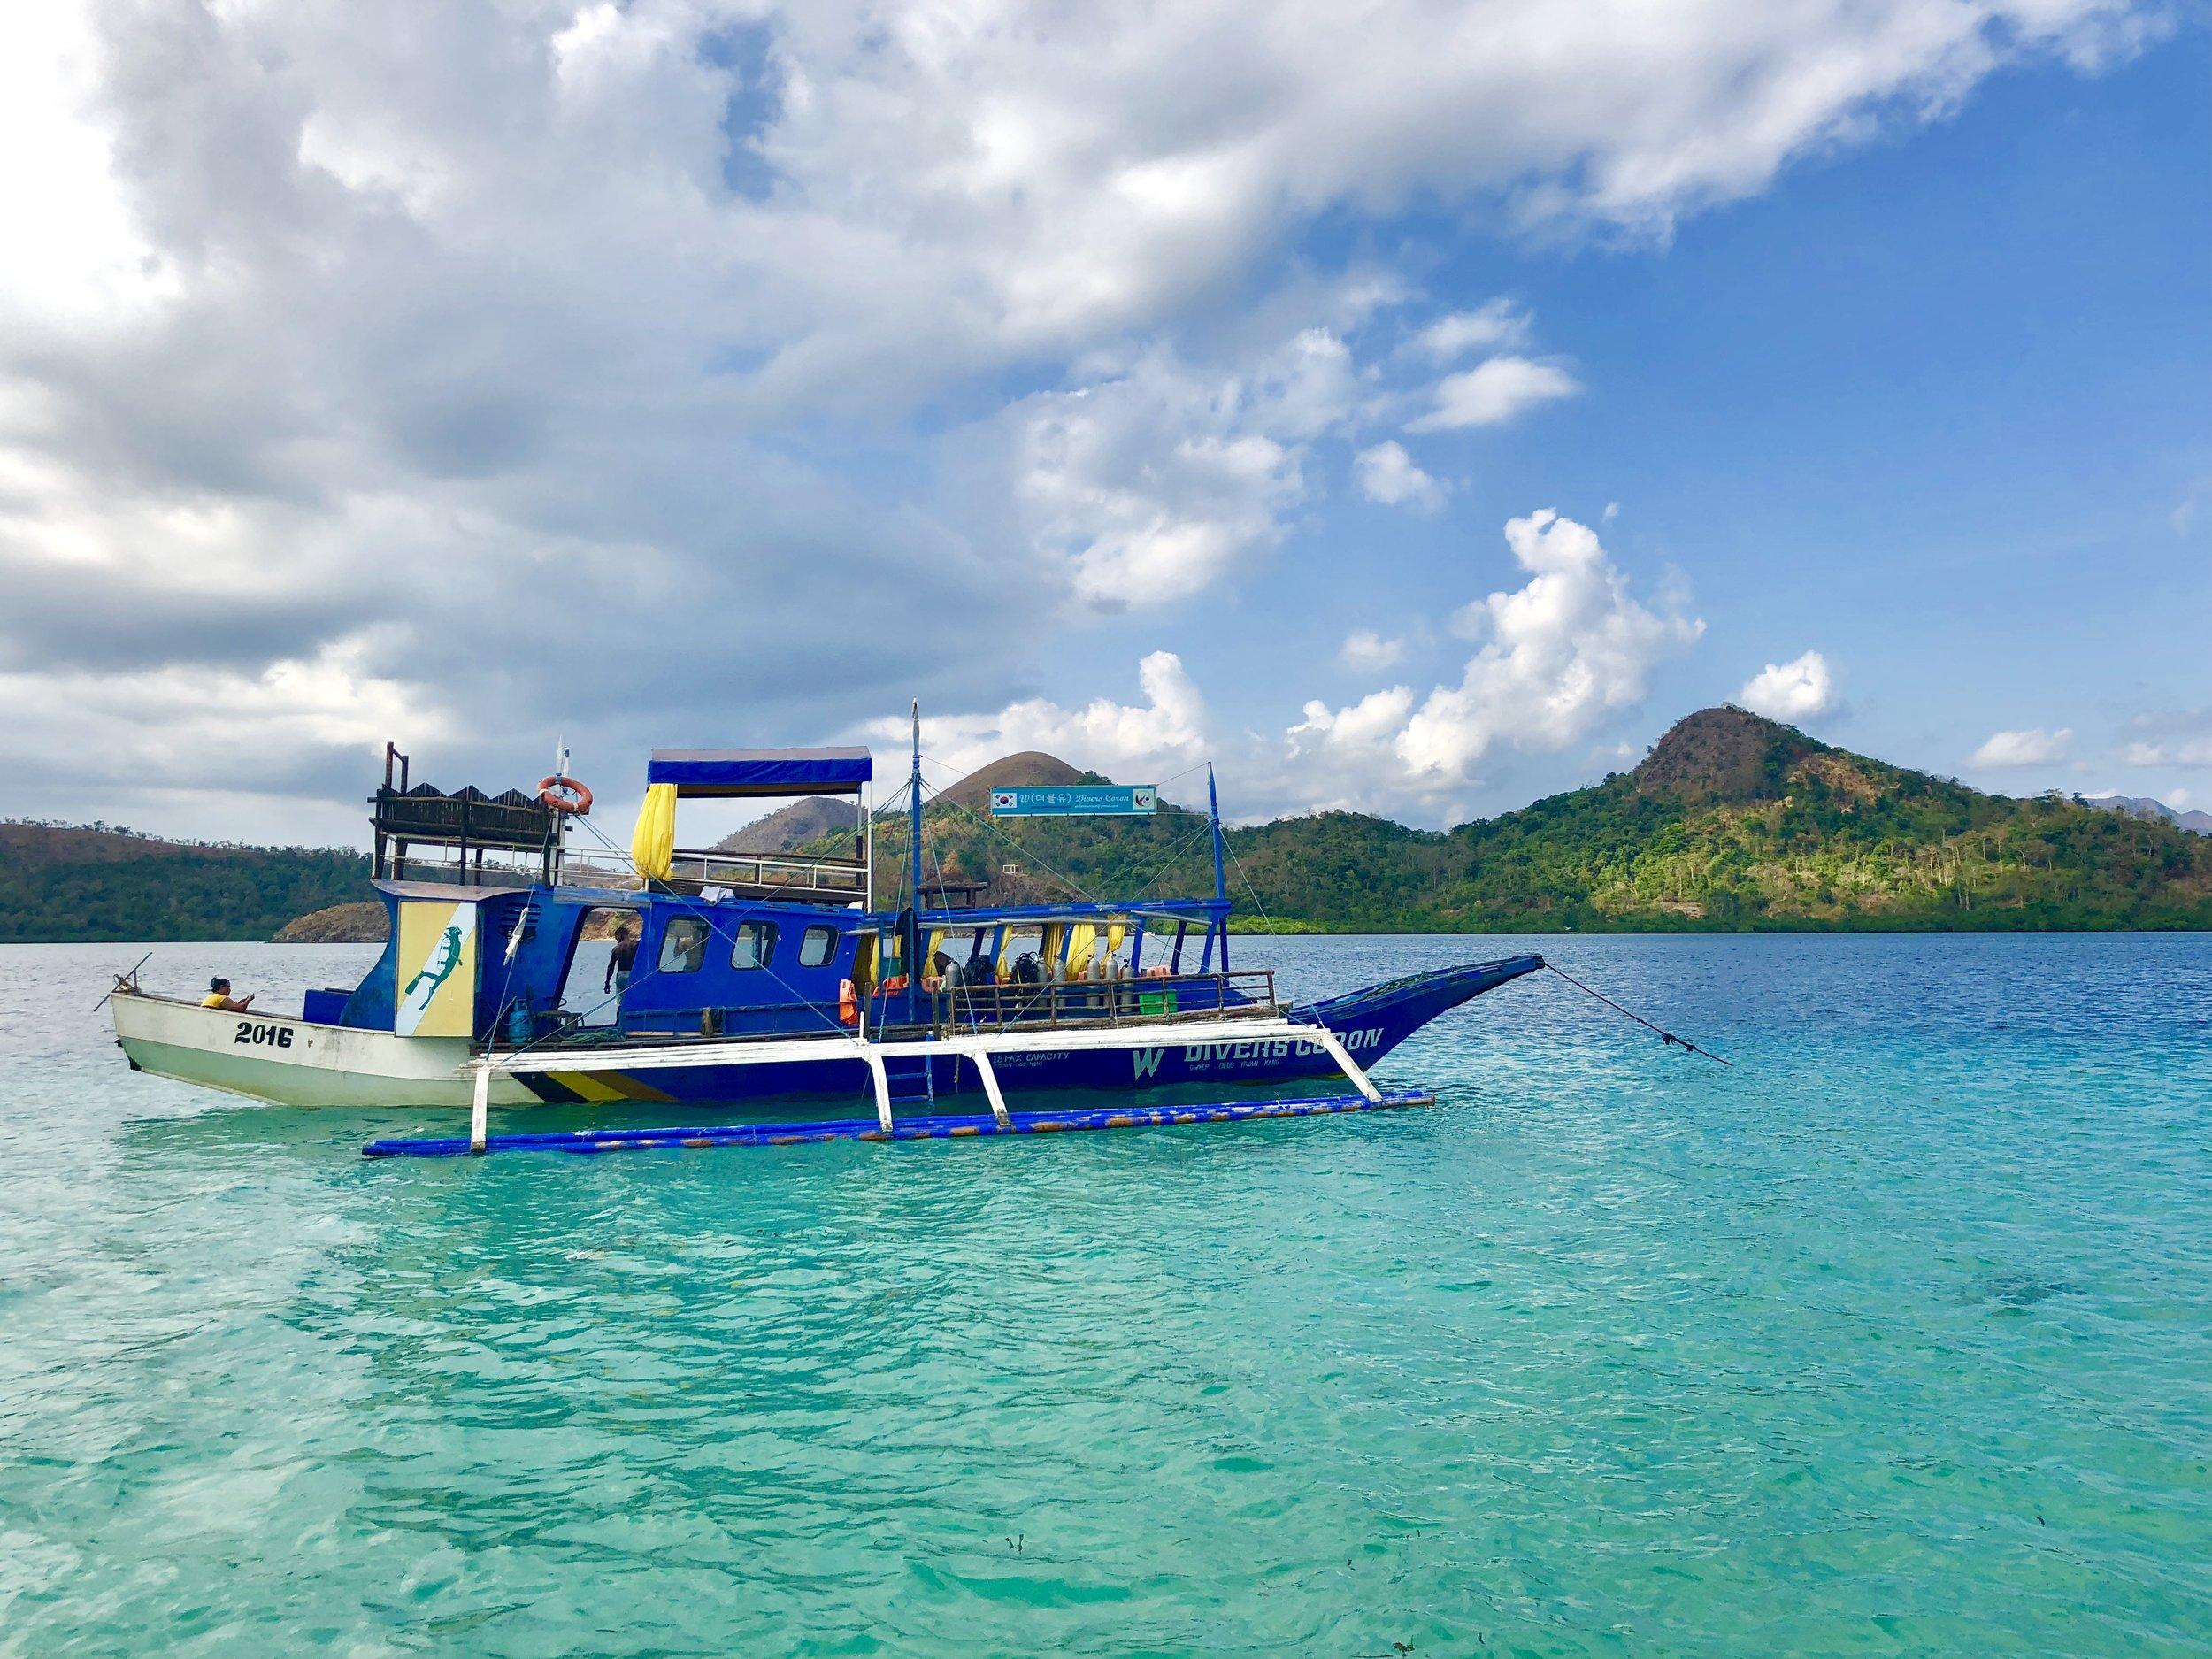 Coron CYC Boat.jpg